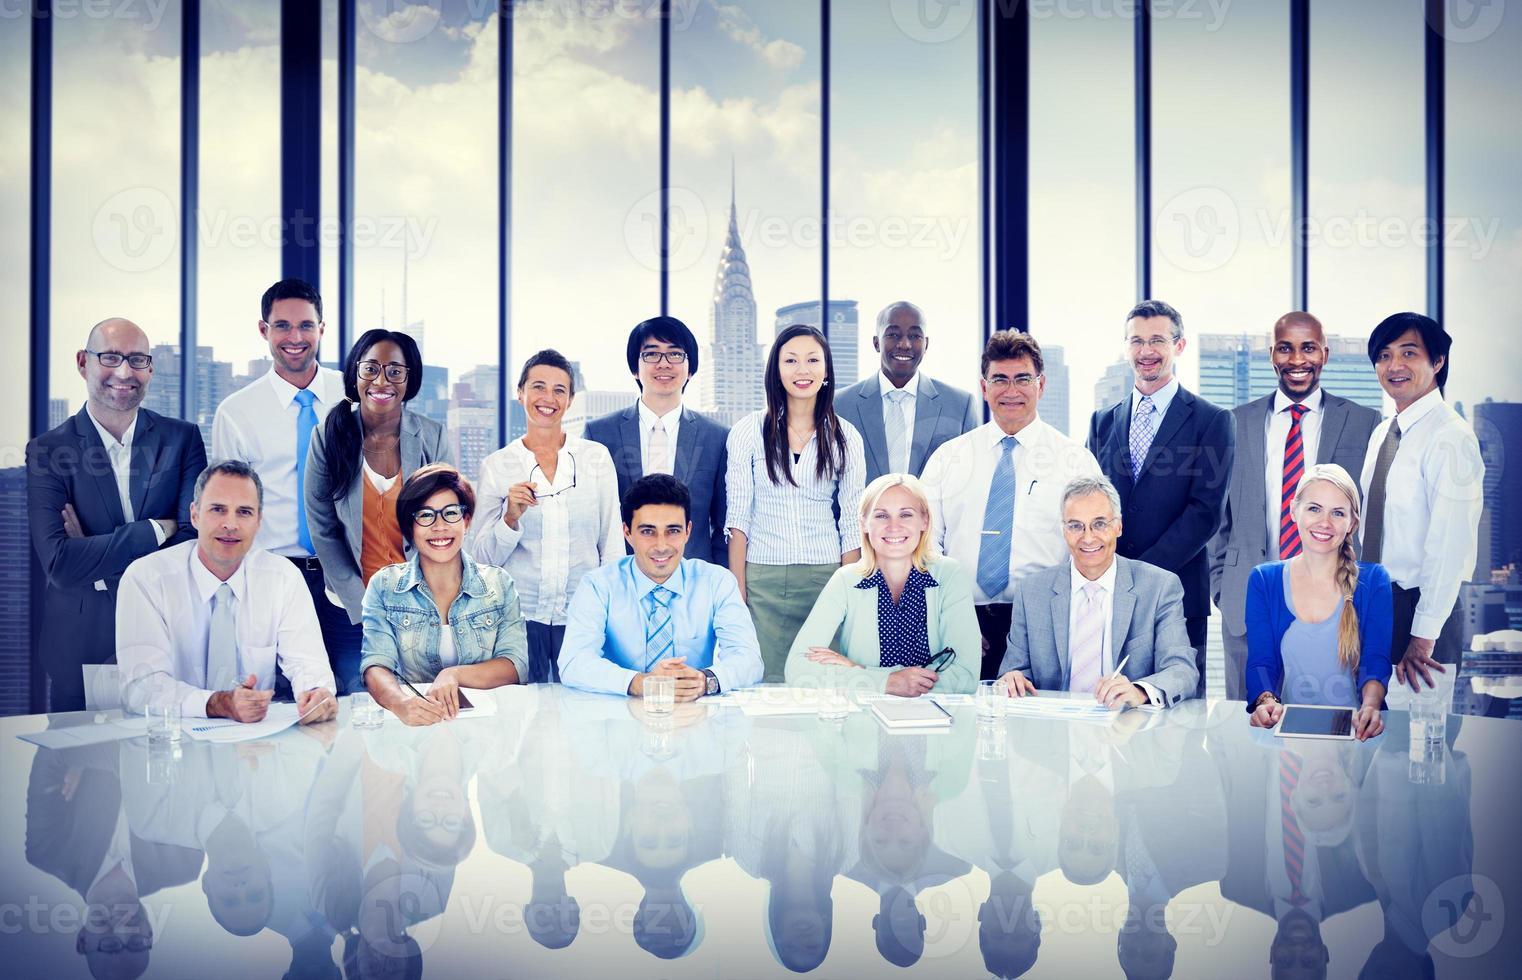 affärsfolk mångfald team företag professionella kontor con foto